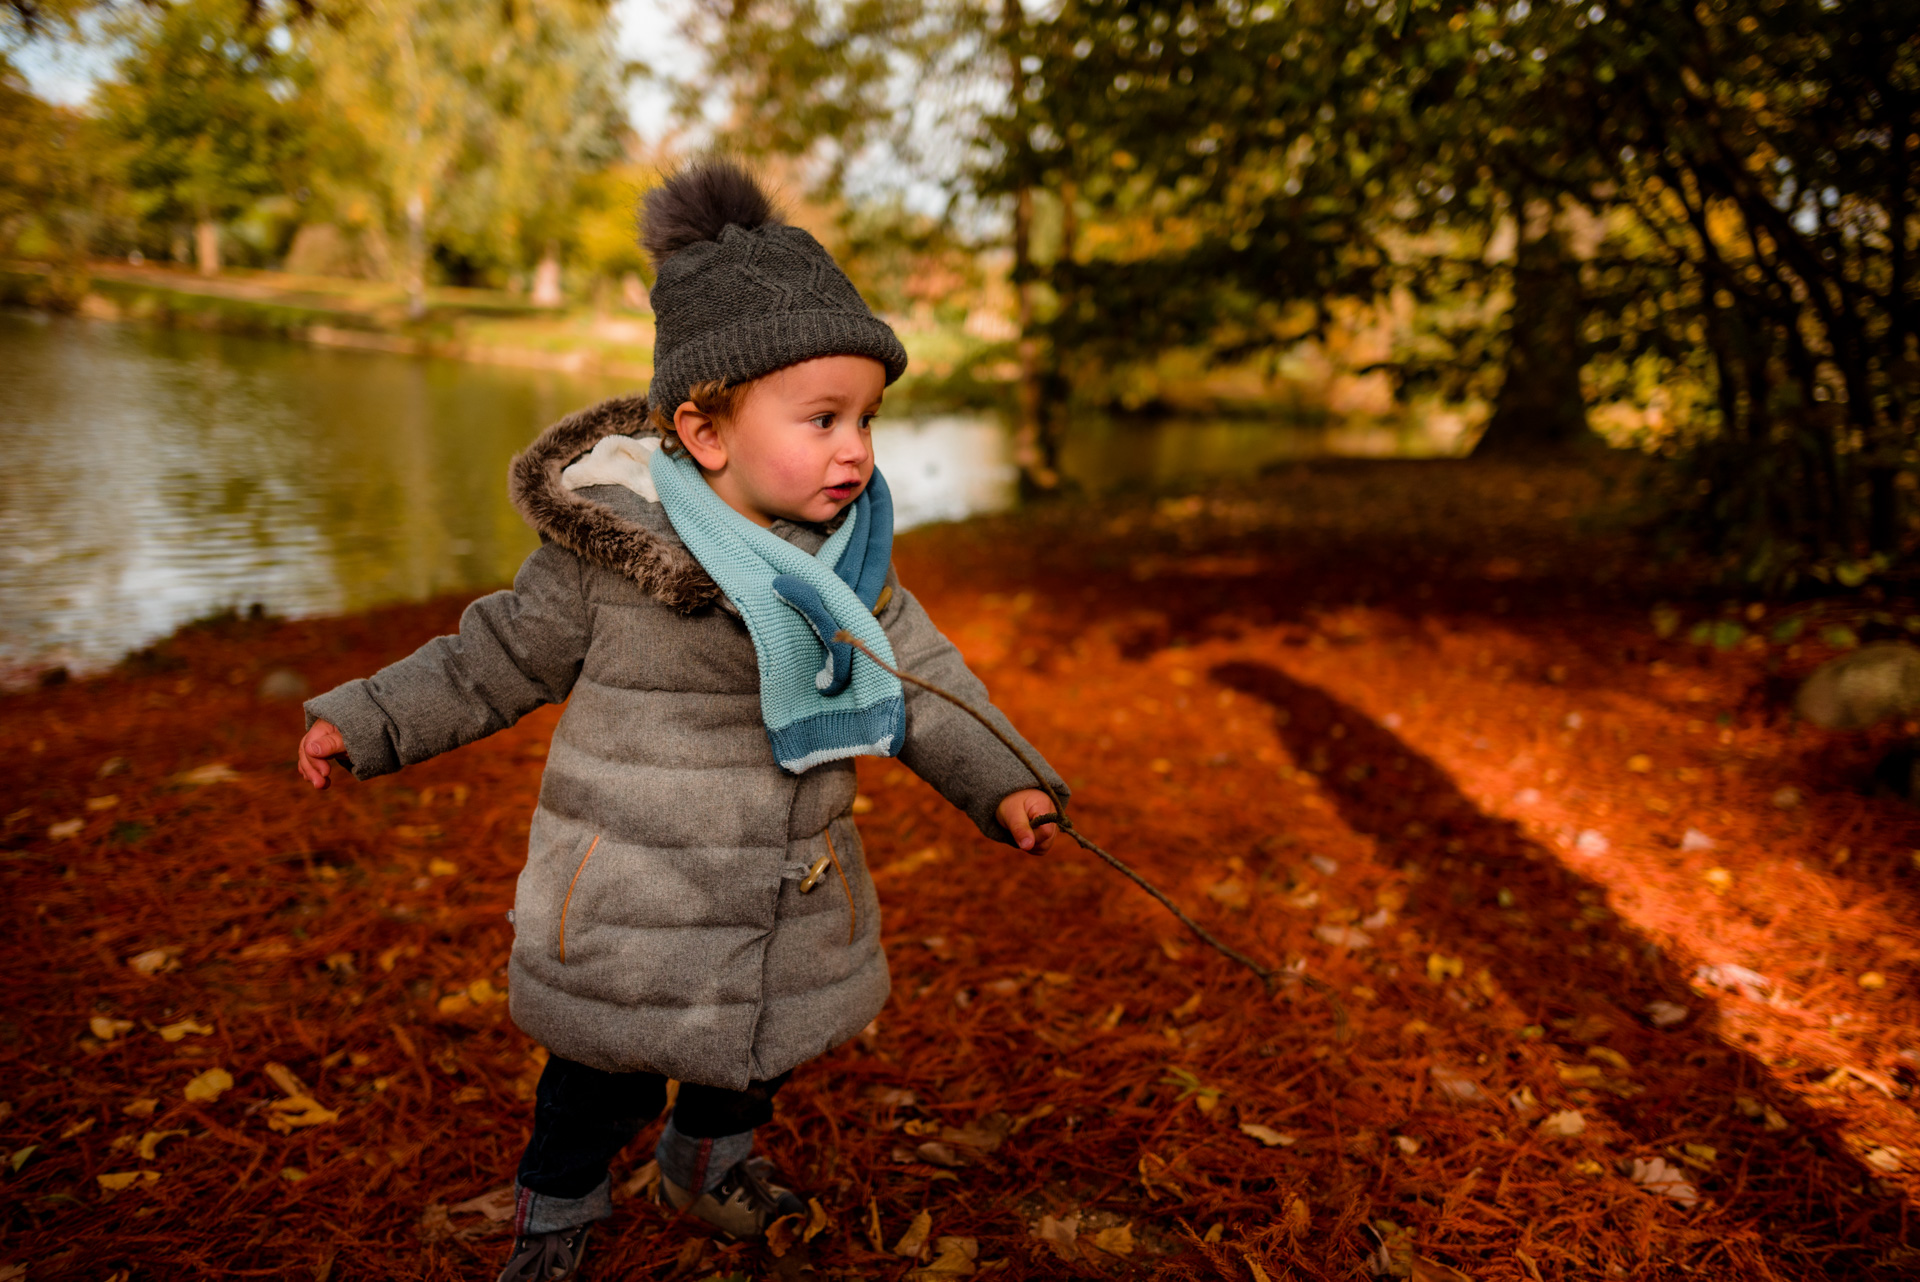 Photographe séance Yvelines automne Vésinet Chatou bébé famille Sandrine siryani